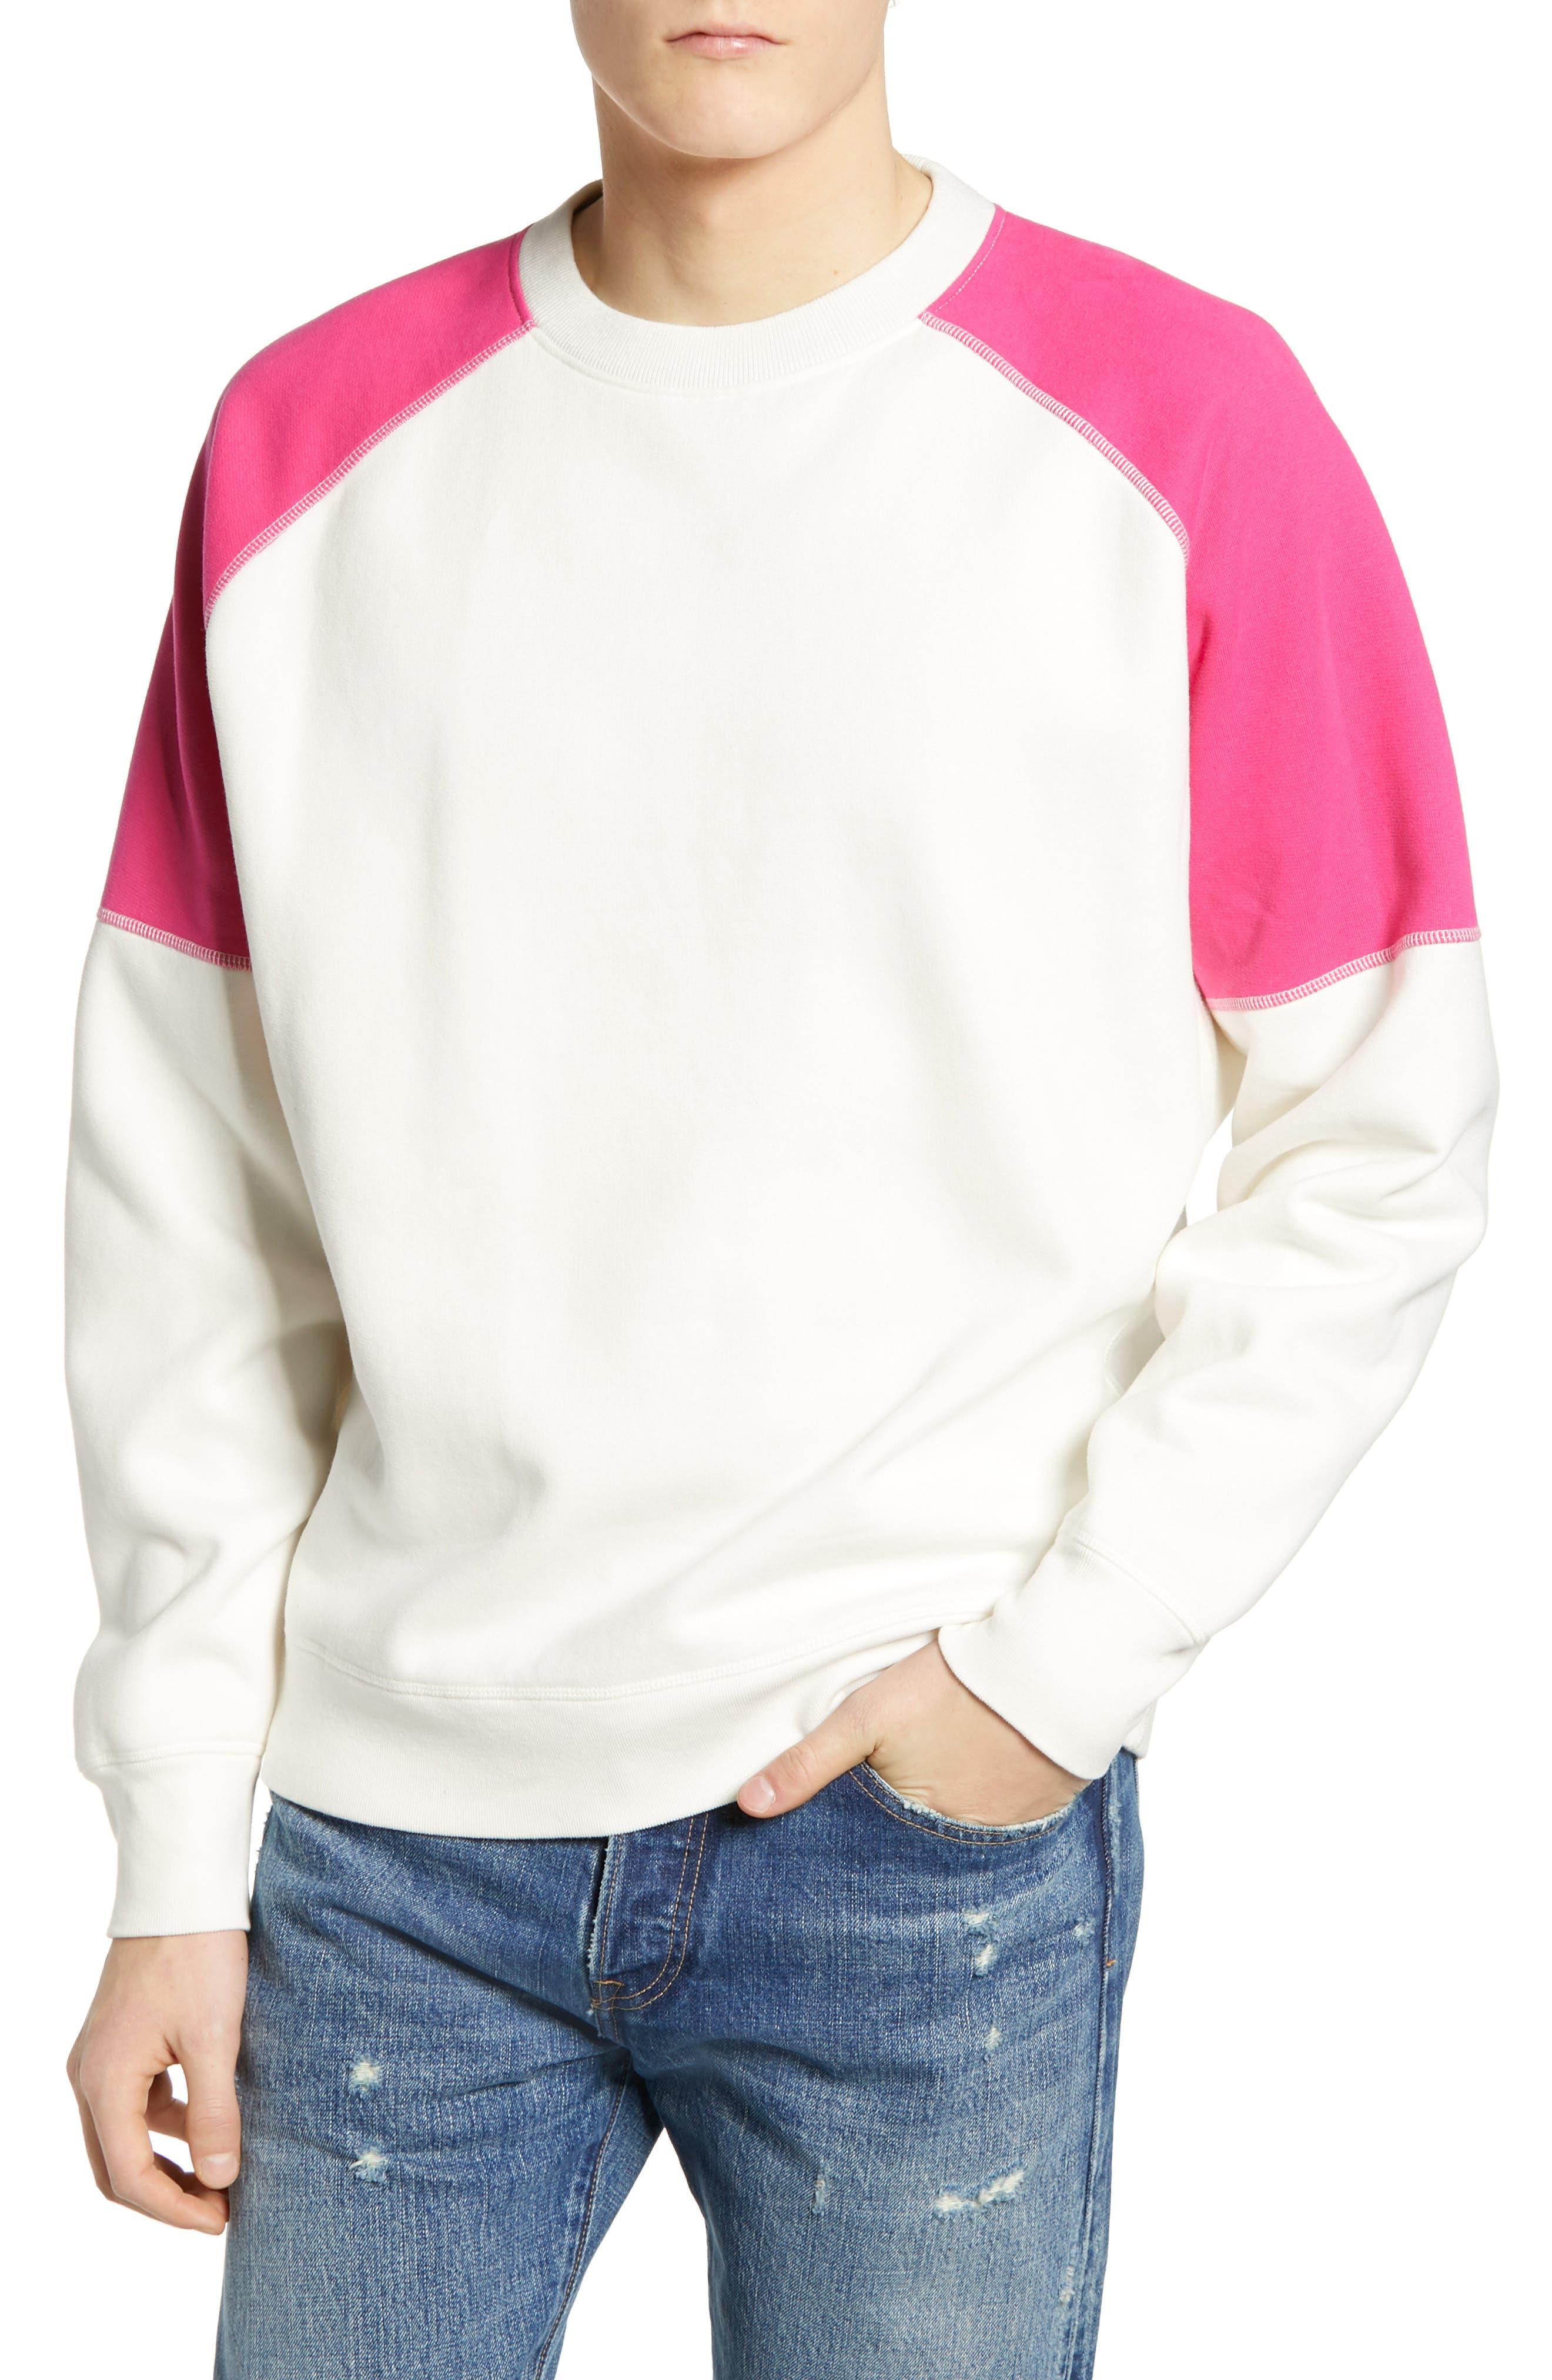 LEVI'S<SUP>®</SUP> MADE & CRAFTED<SUP>™</SUP>, Regular Fit Raglan Sweatshirt, Main thumbnail 1, color, WHITE ALYSSUM